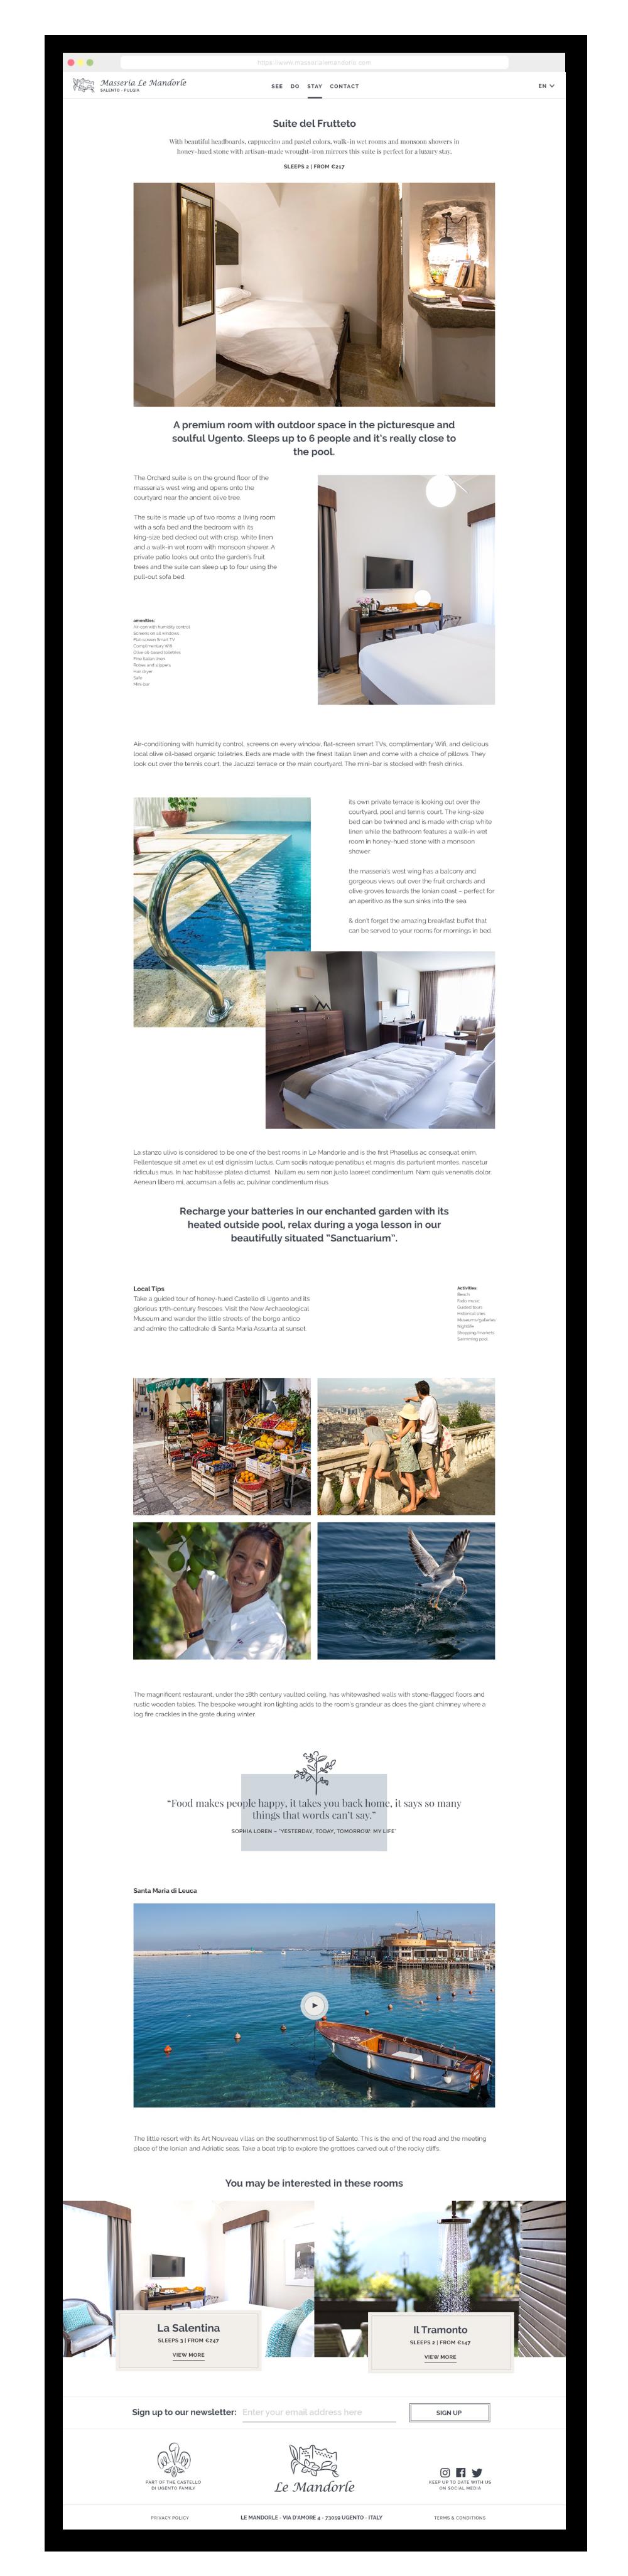 mobile-responsive-ui-design-ux-inspiration-le-mandorle-hotel